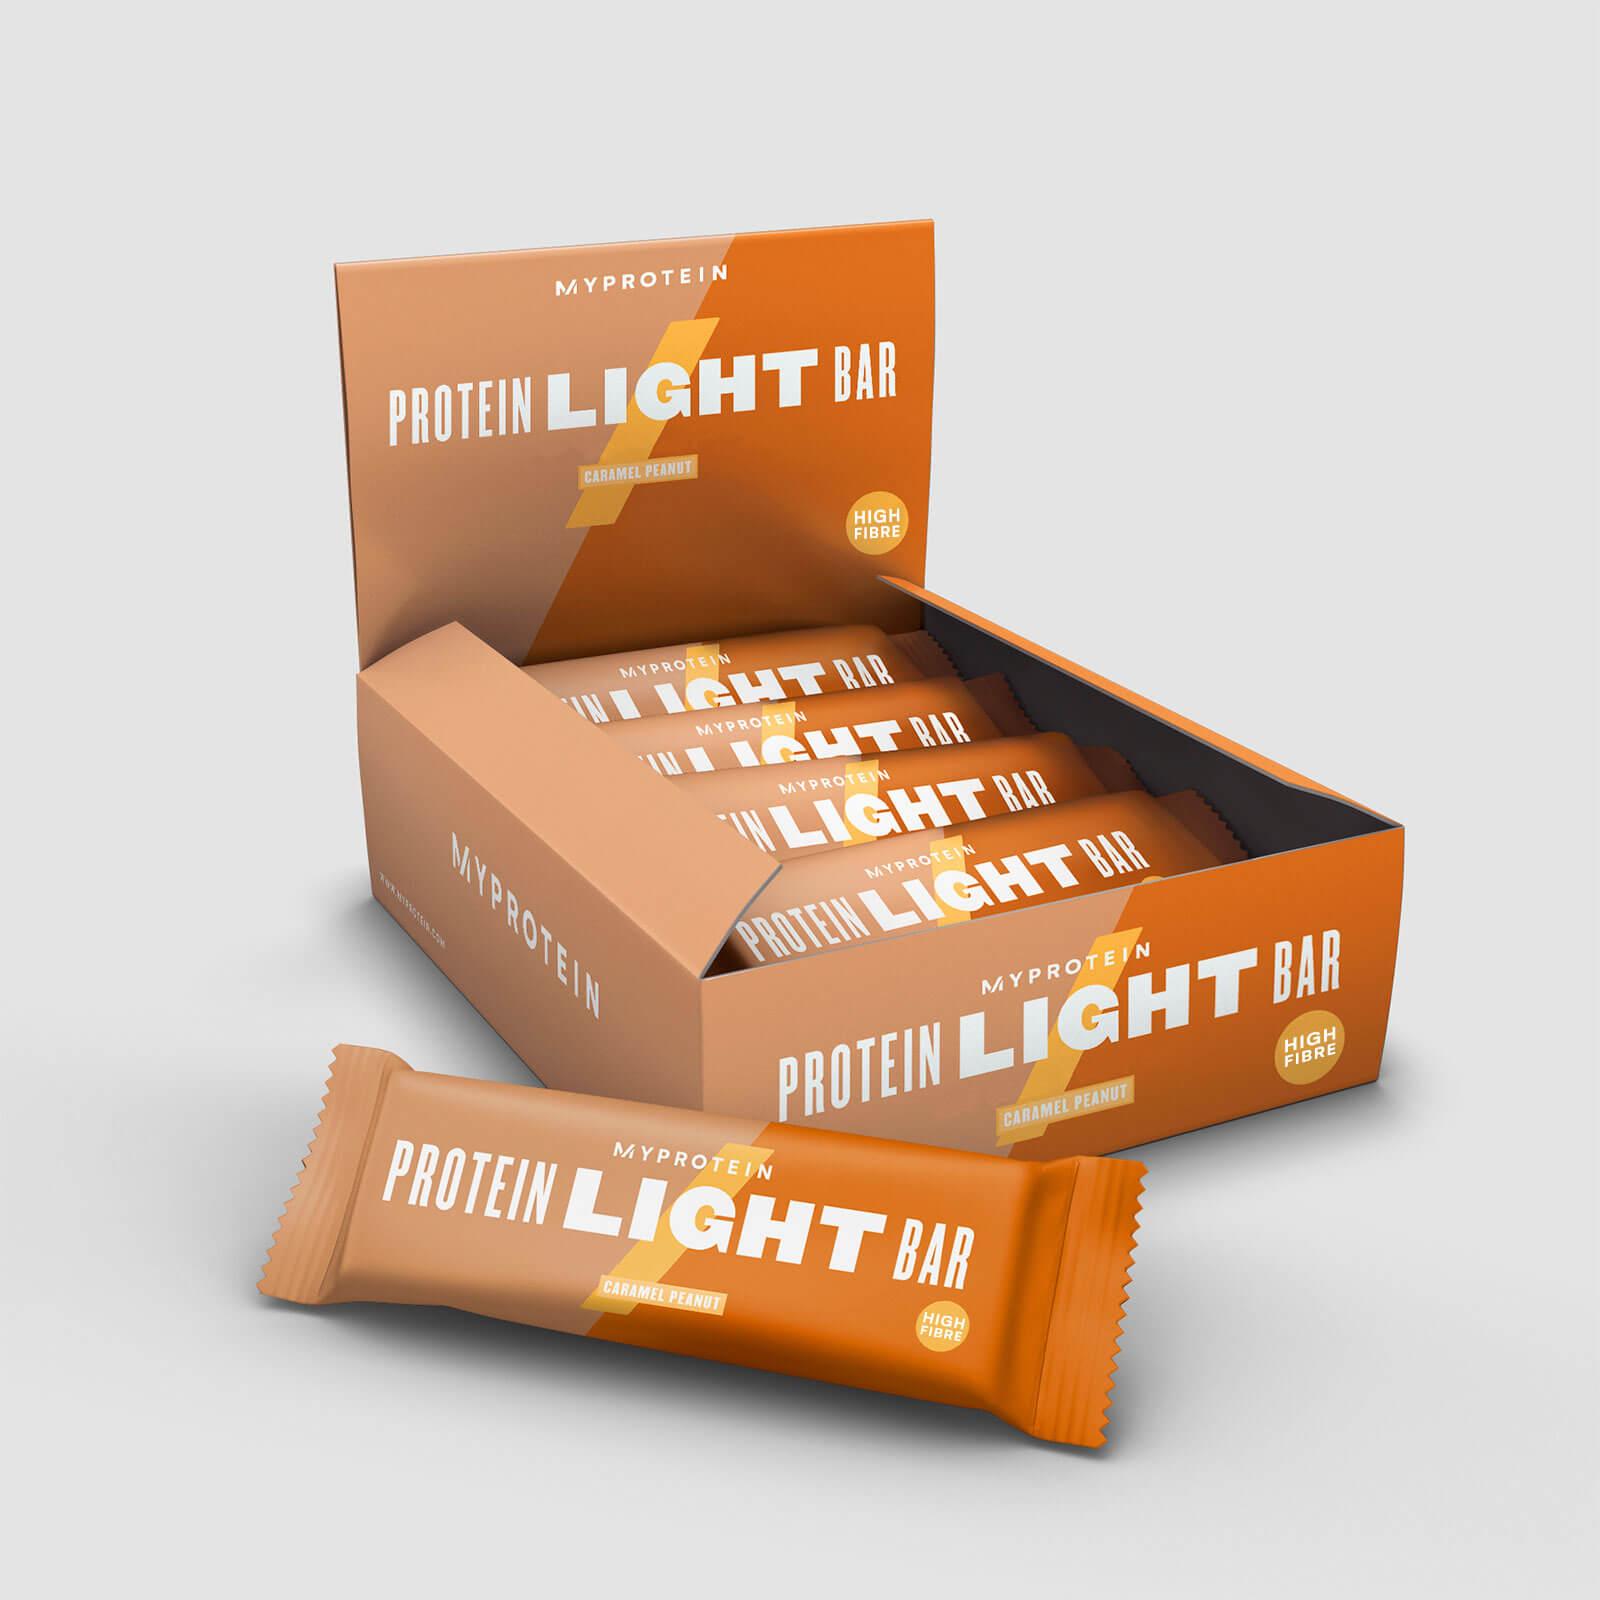 Myprotein MyLight Bar - 12 x 65g - Caramel et cacahuetes